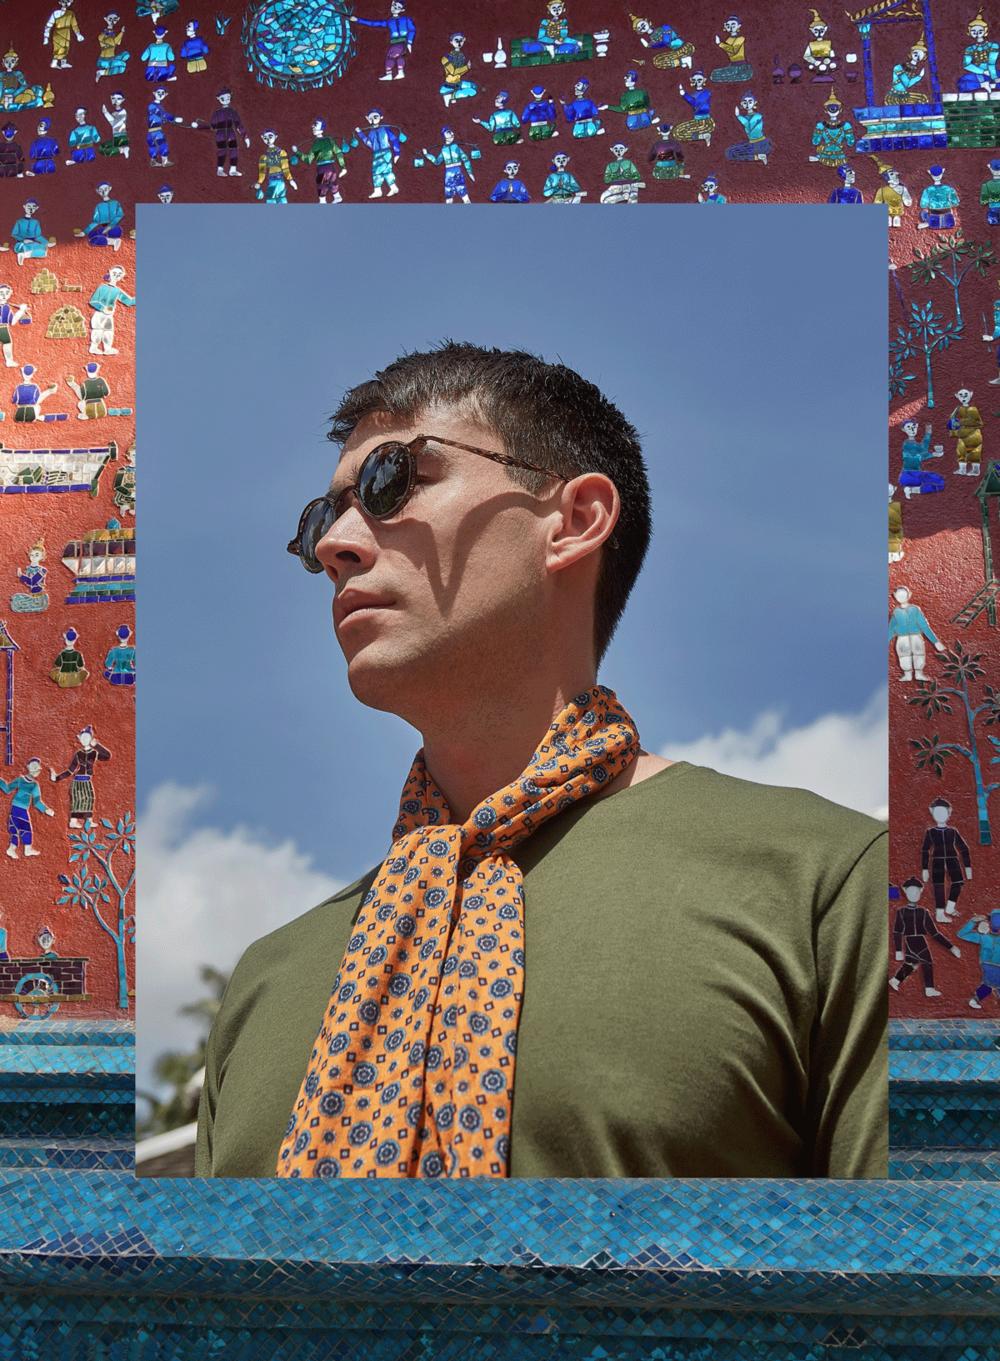 Tshirt : gingko / sunglasses : Tavat eyewear